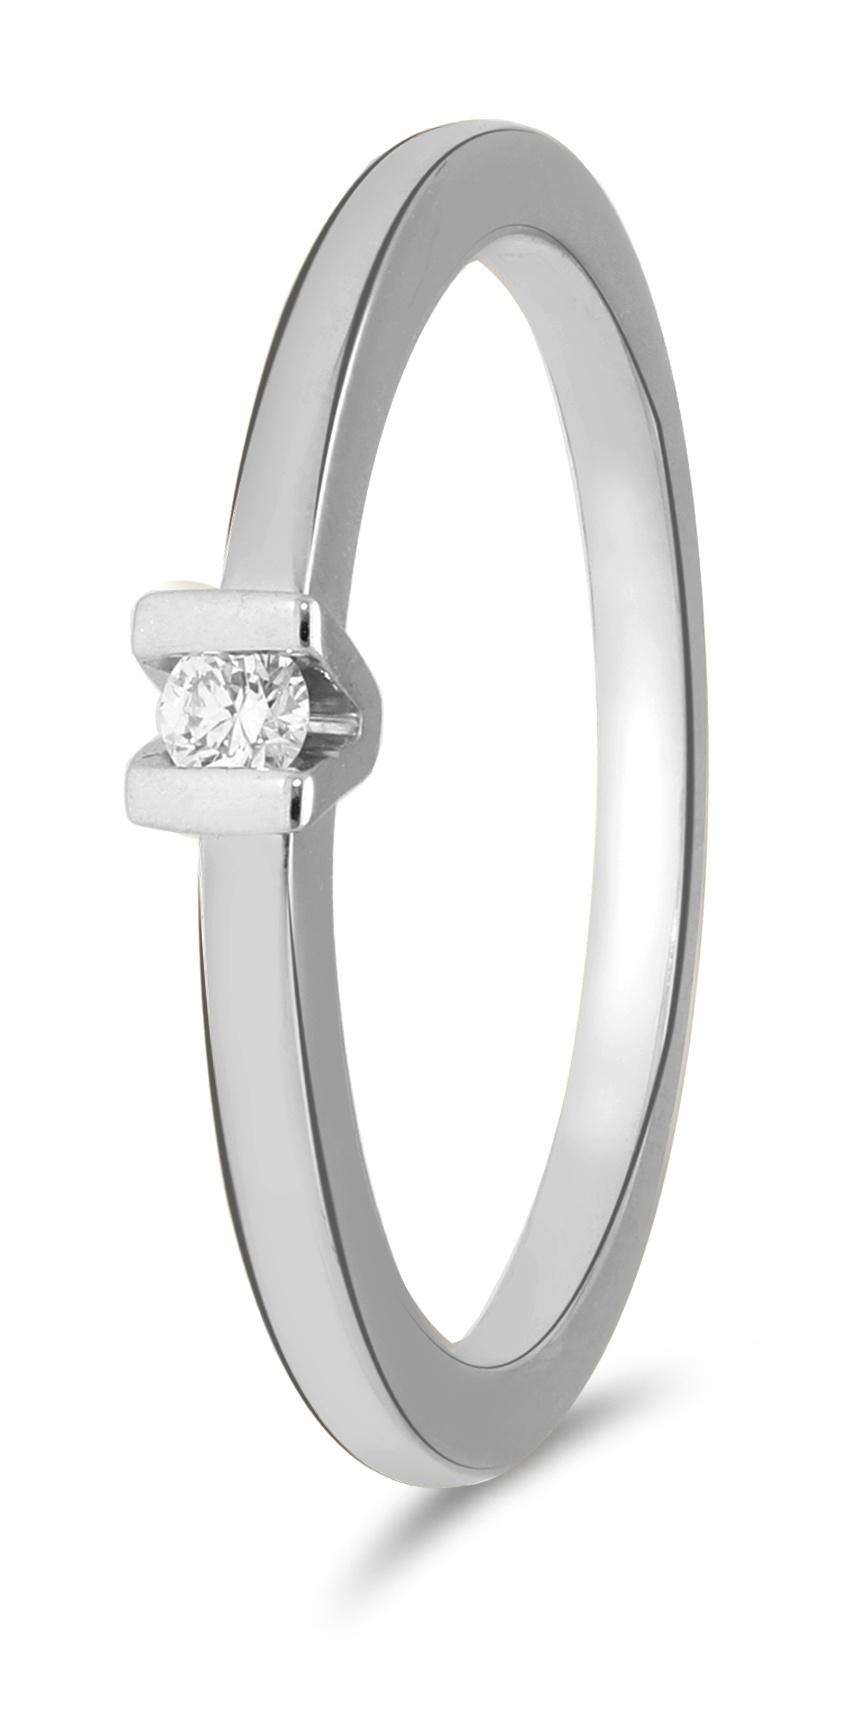 14 karaat witgouden ring met 1 diamant 0.05 crt. - Solitair - Witgoud-1